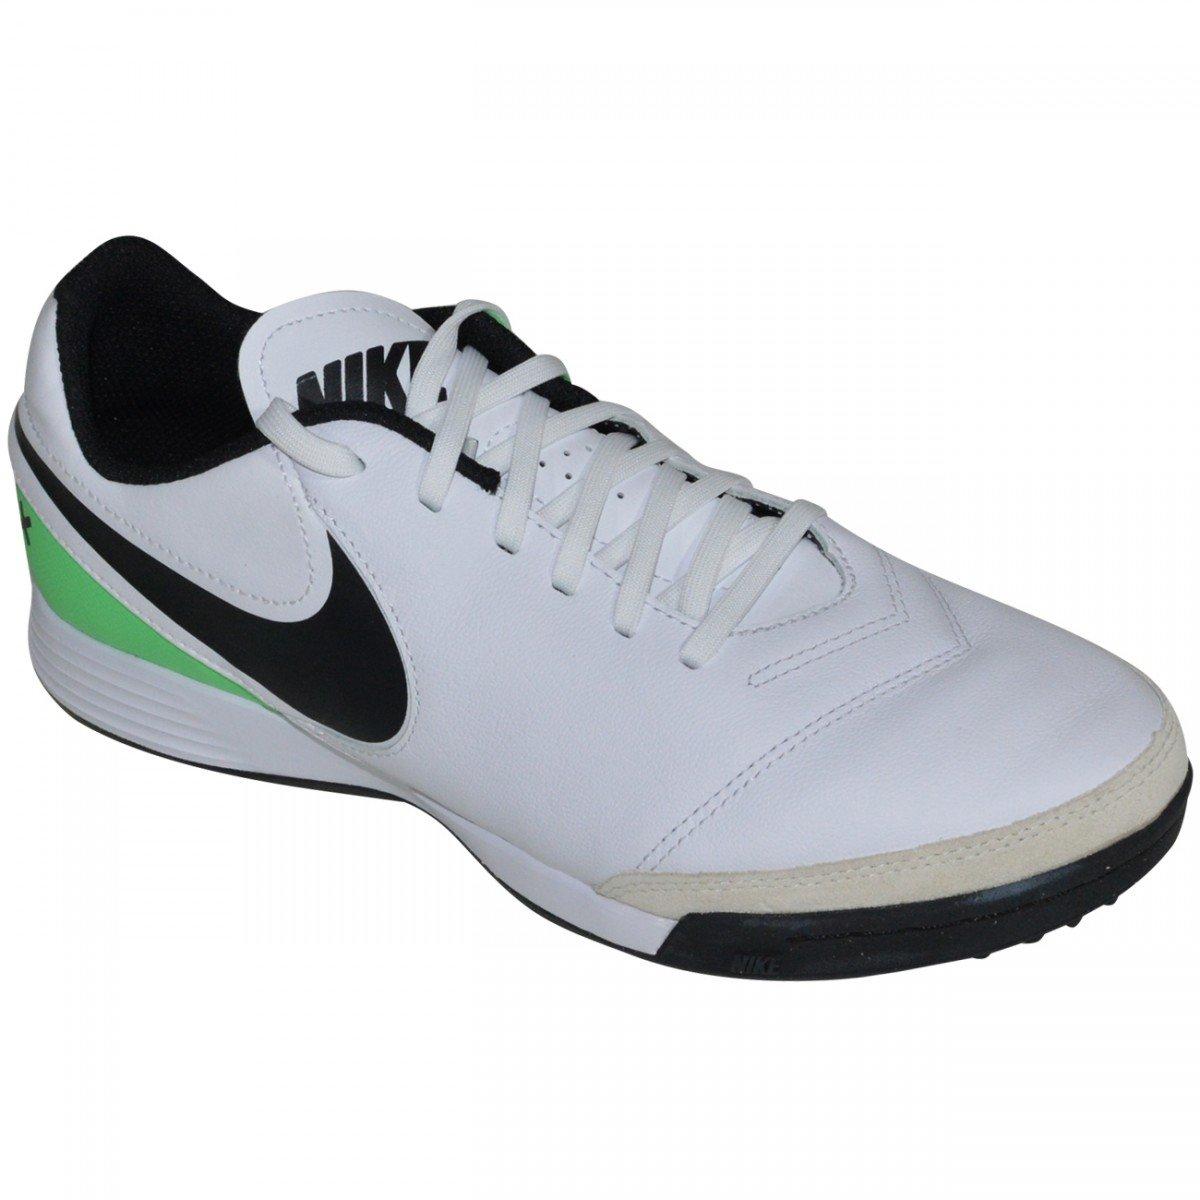 Chuteira Society Nike Tiempox Genio II Leather - Compre Agora  bebabc59dcc78